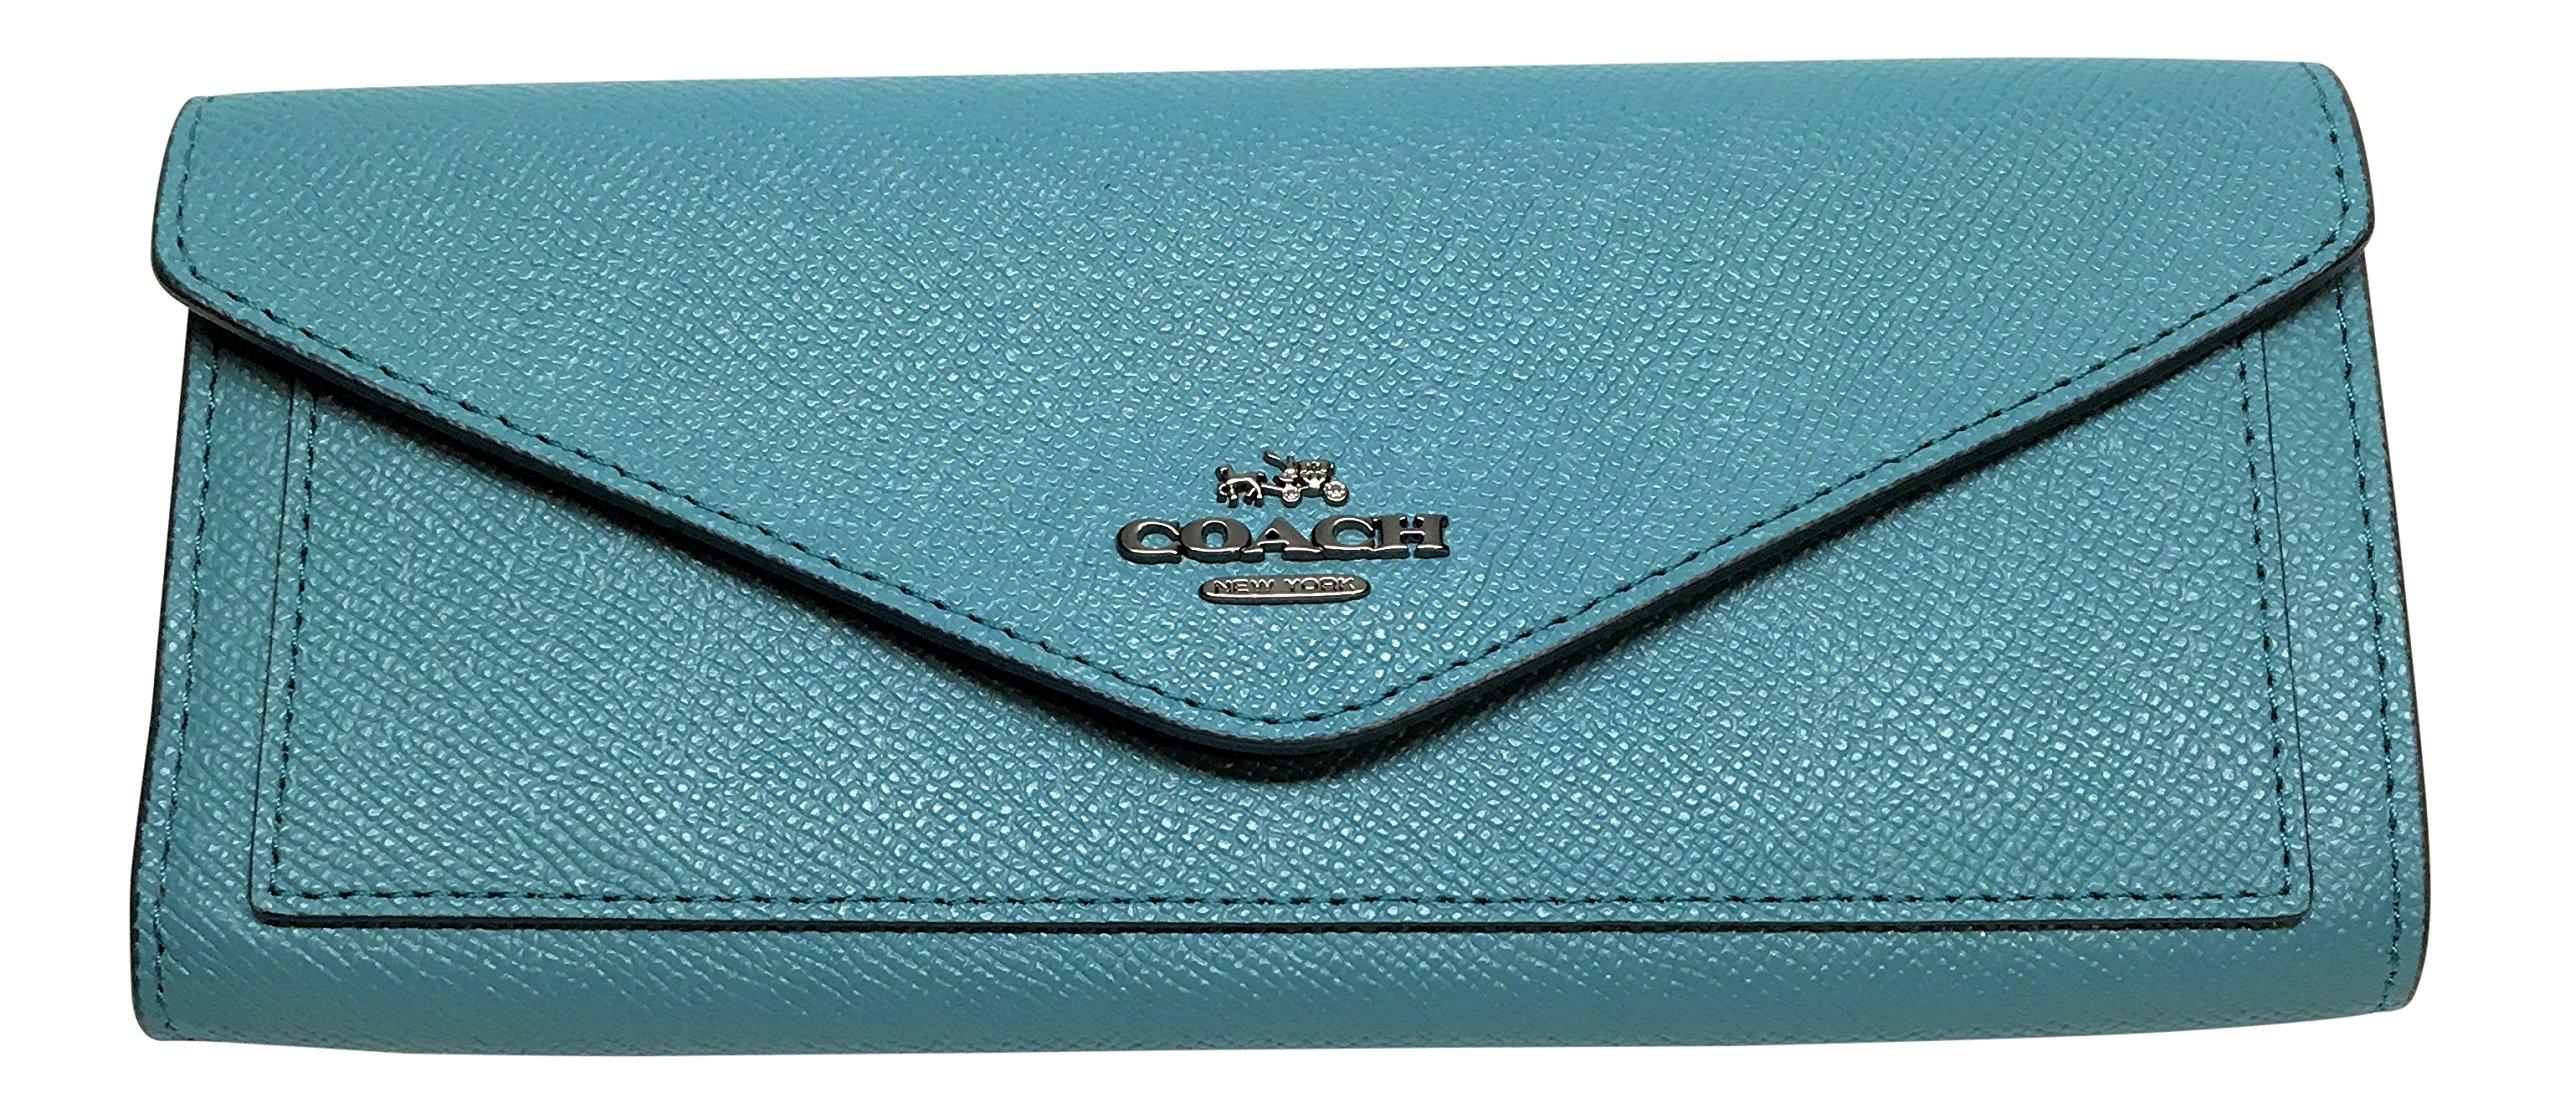 Coach Crossgrain Leather Soft Wallet Ocean 57715